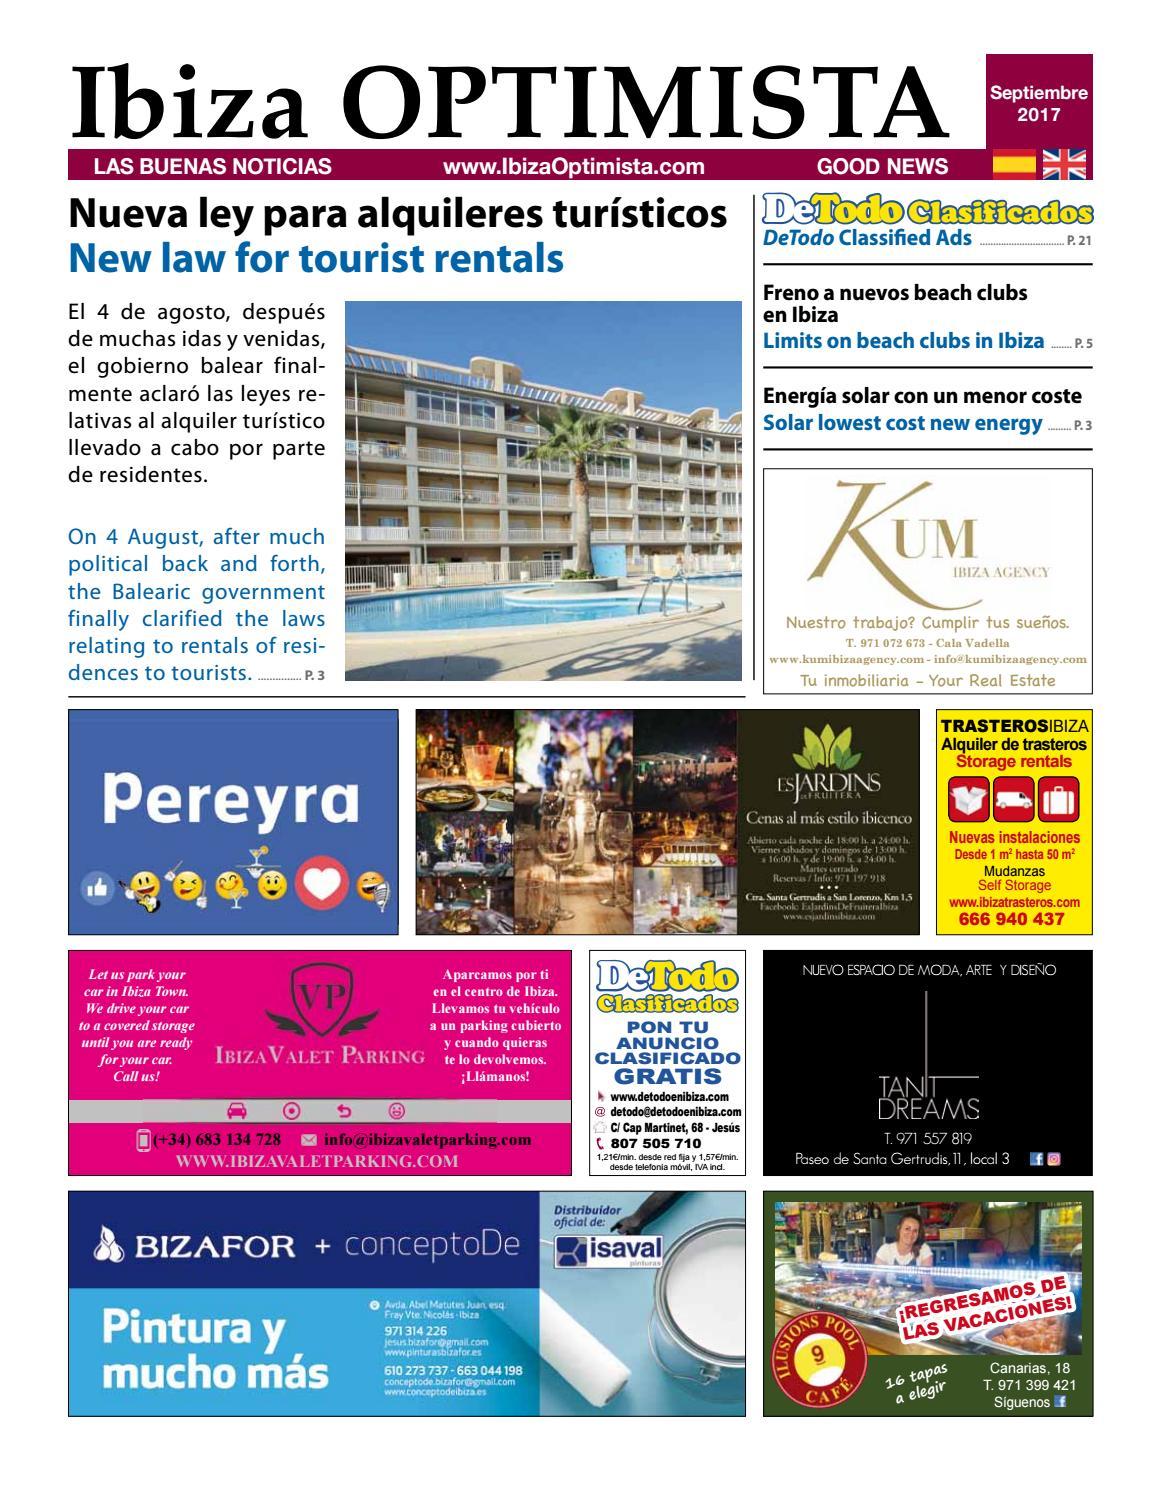 By Septiembre Ibiza 2017 Ibizaoptimista Optimista Issuu NnwP8kO0X